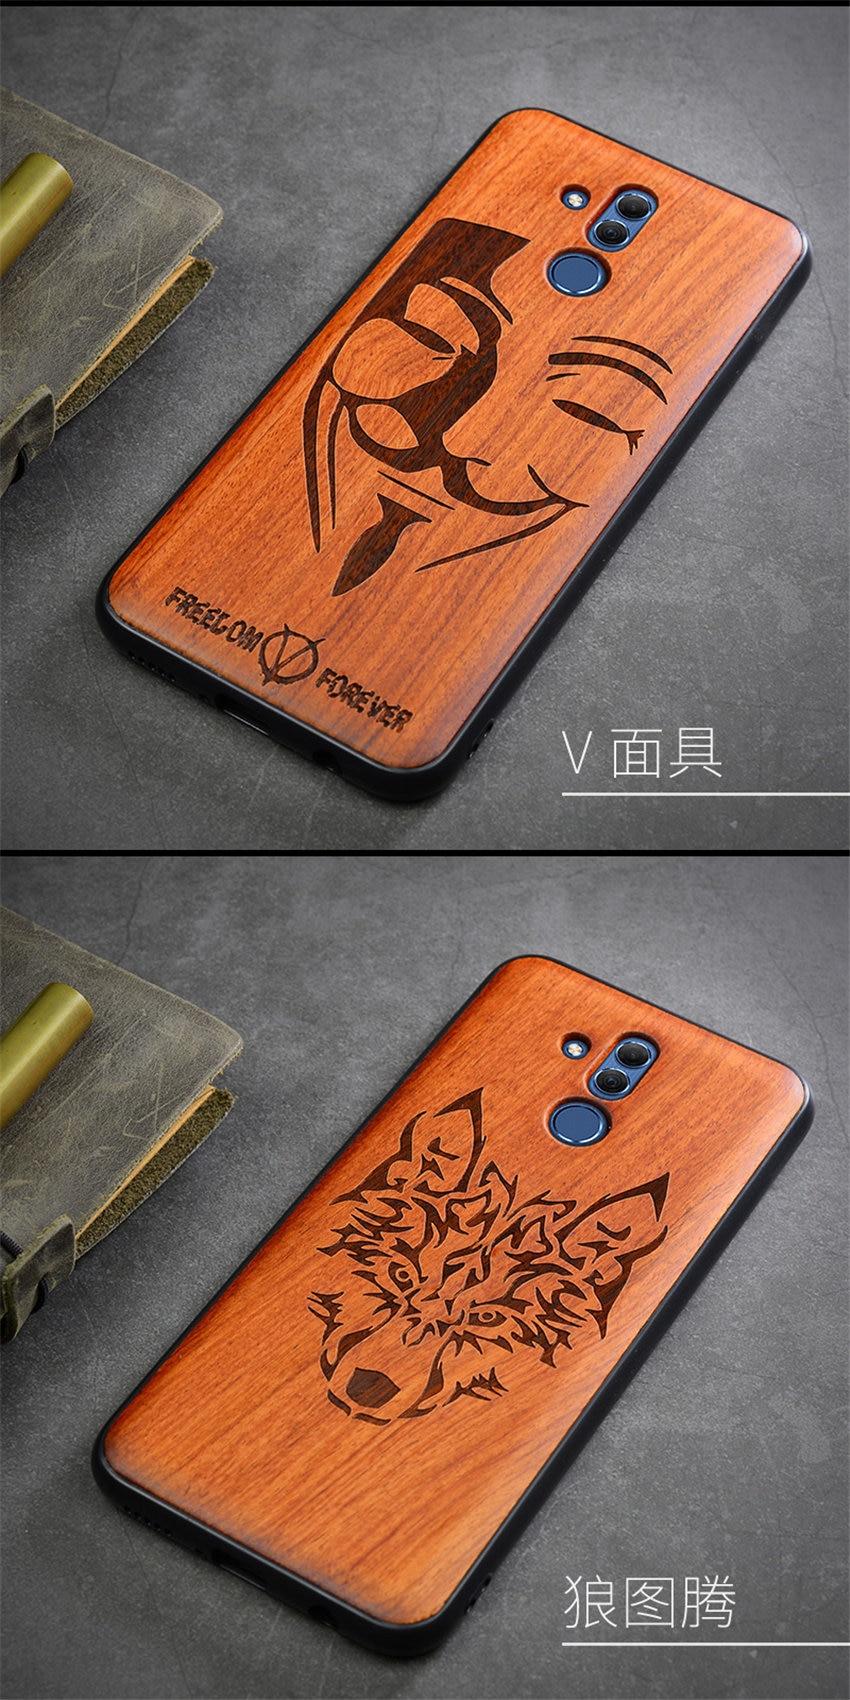 2018 New Huawei Mate 20 Lite Case Slim Wood Back Cover TPU Bumper Case For Huawei Mate 20 Lite Phone Cases Mate20 lite (13)